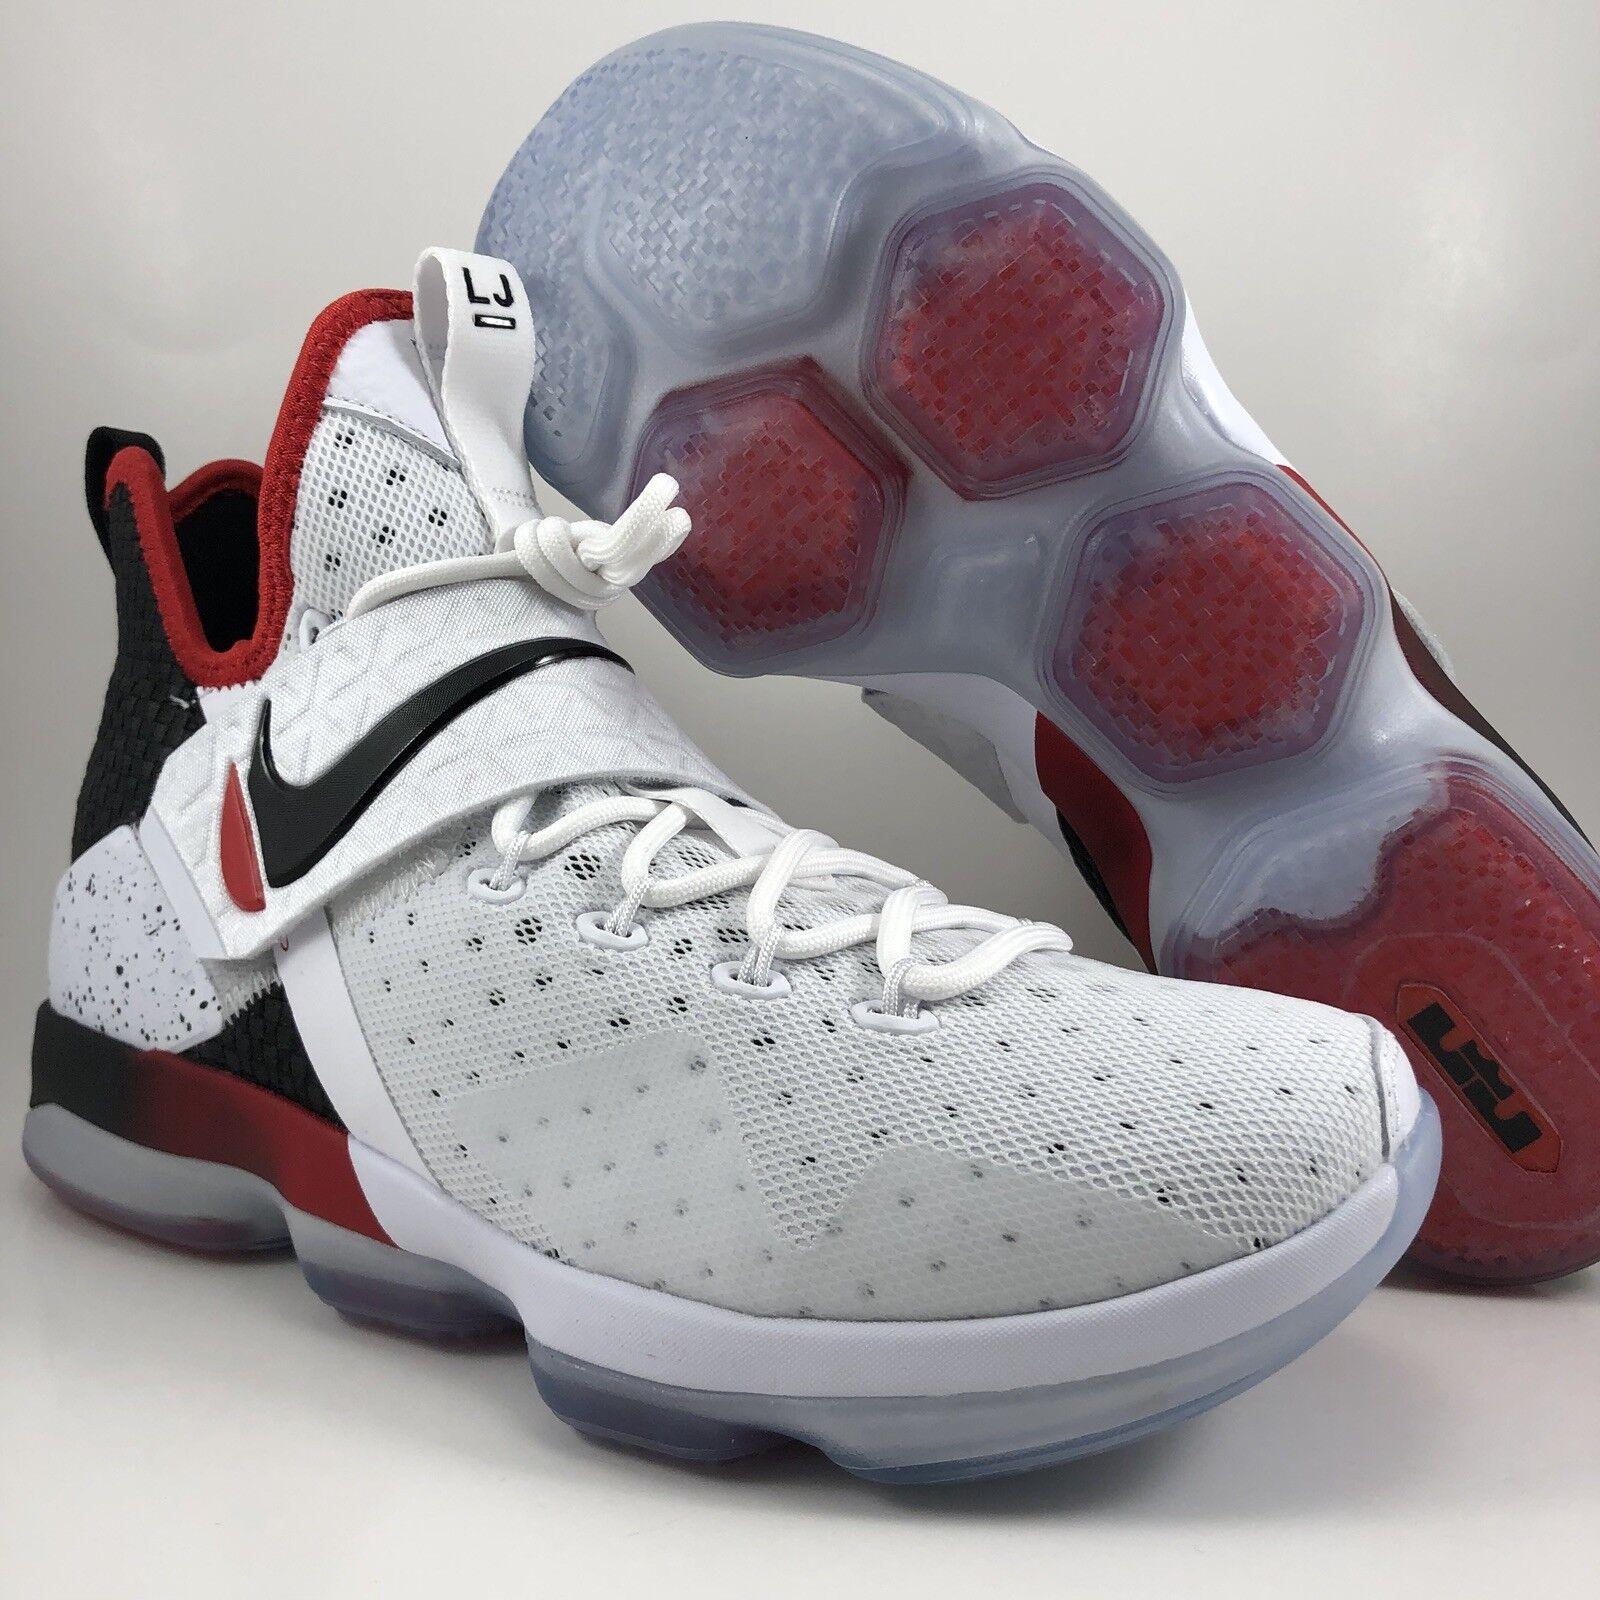 Nike Lebron XIV Flip the Switch Basketball schuhe Mens Größe 10.5 (852405 103)